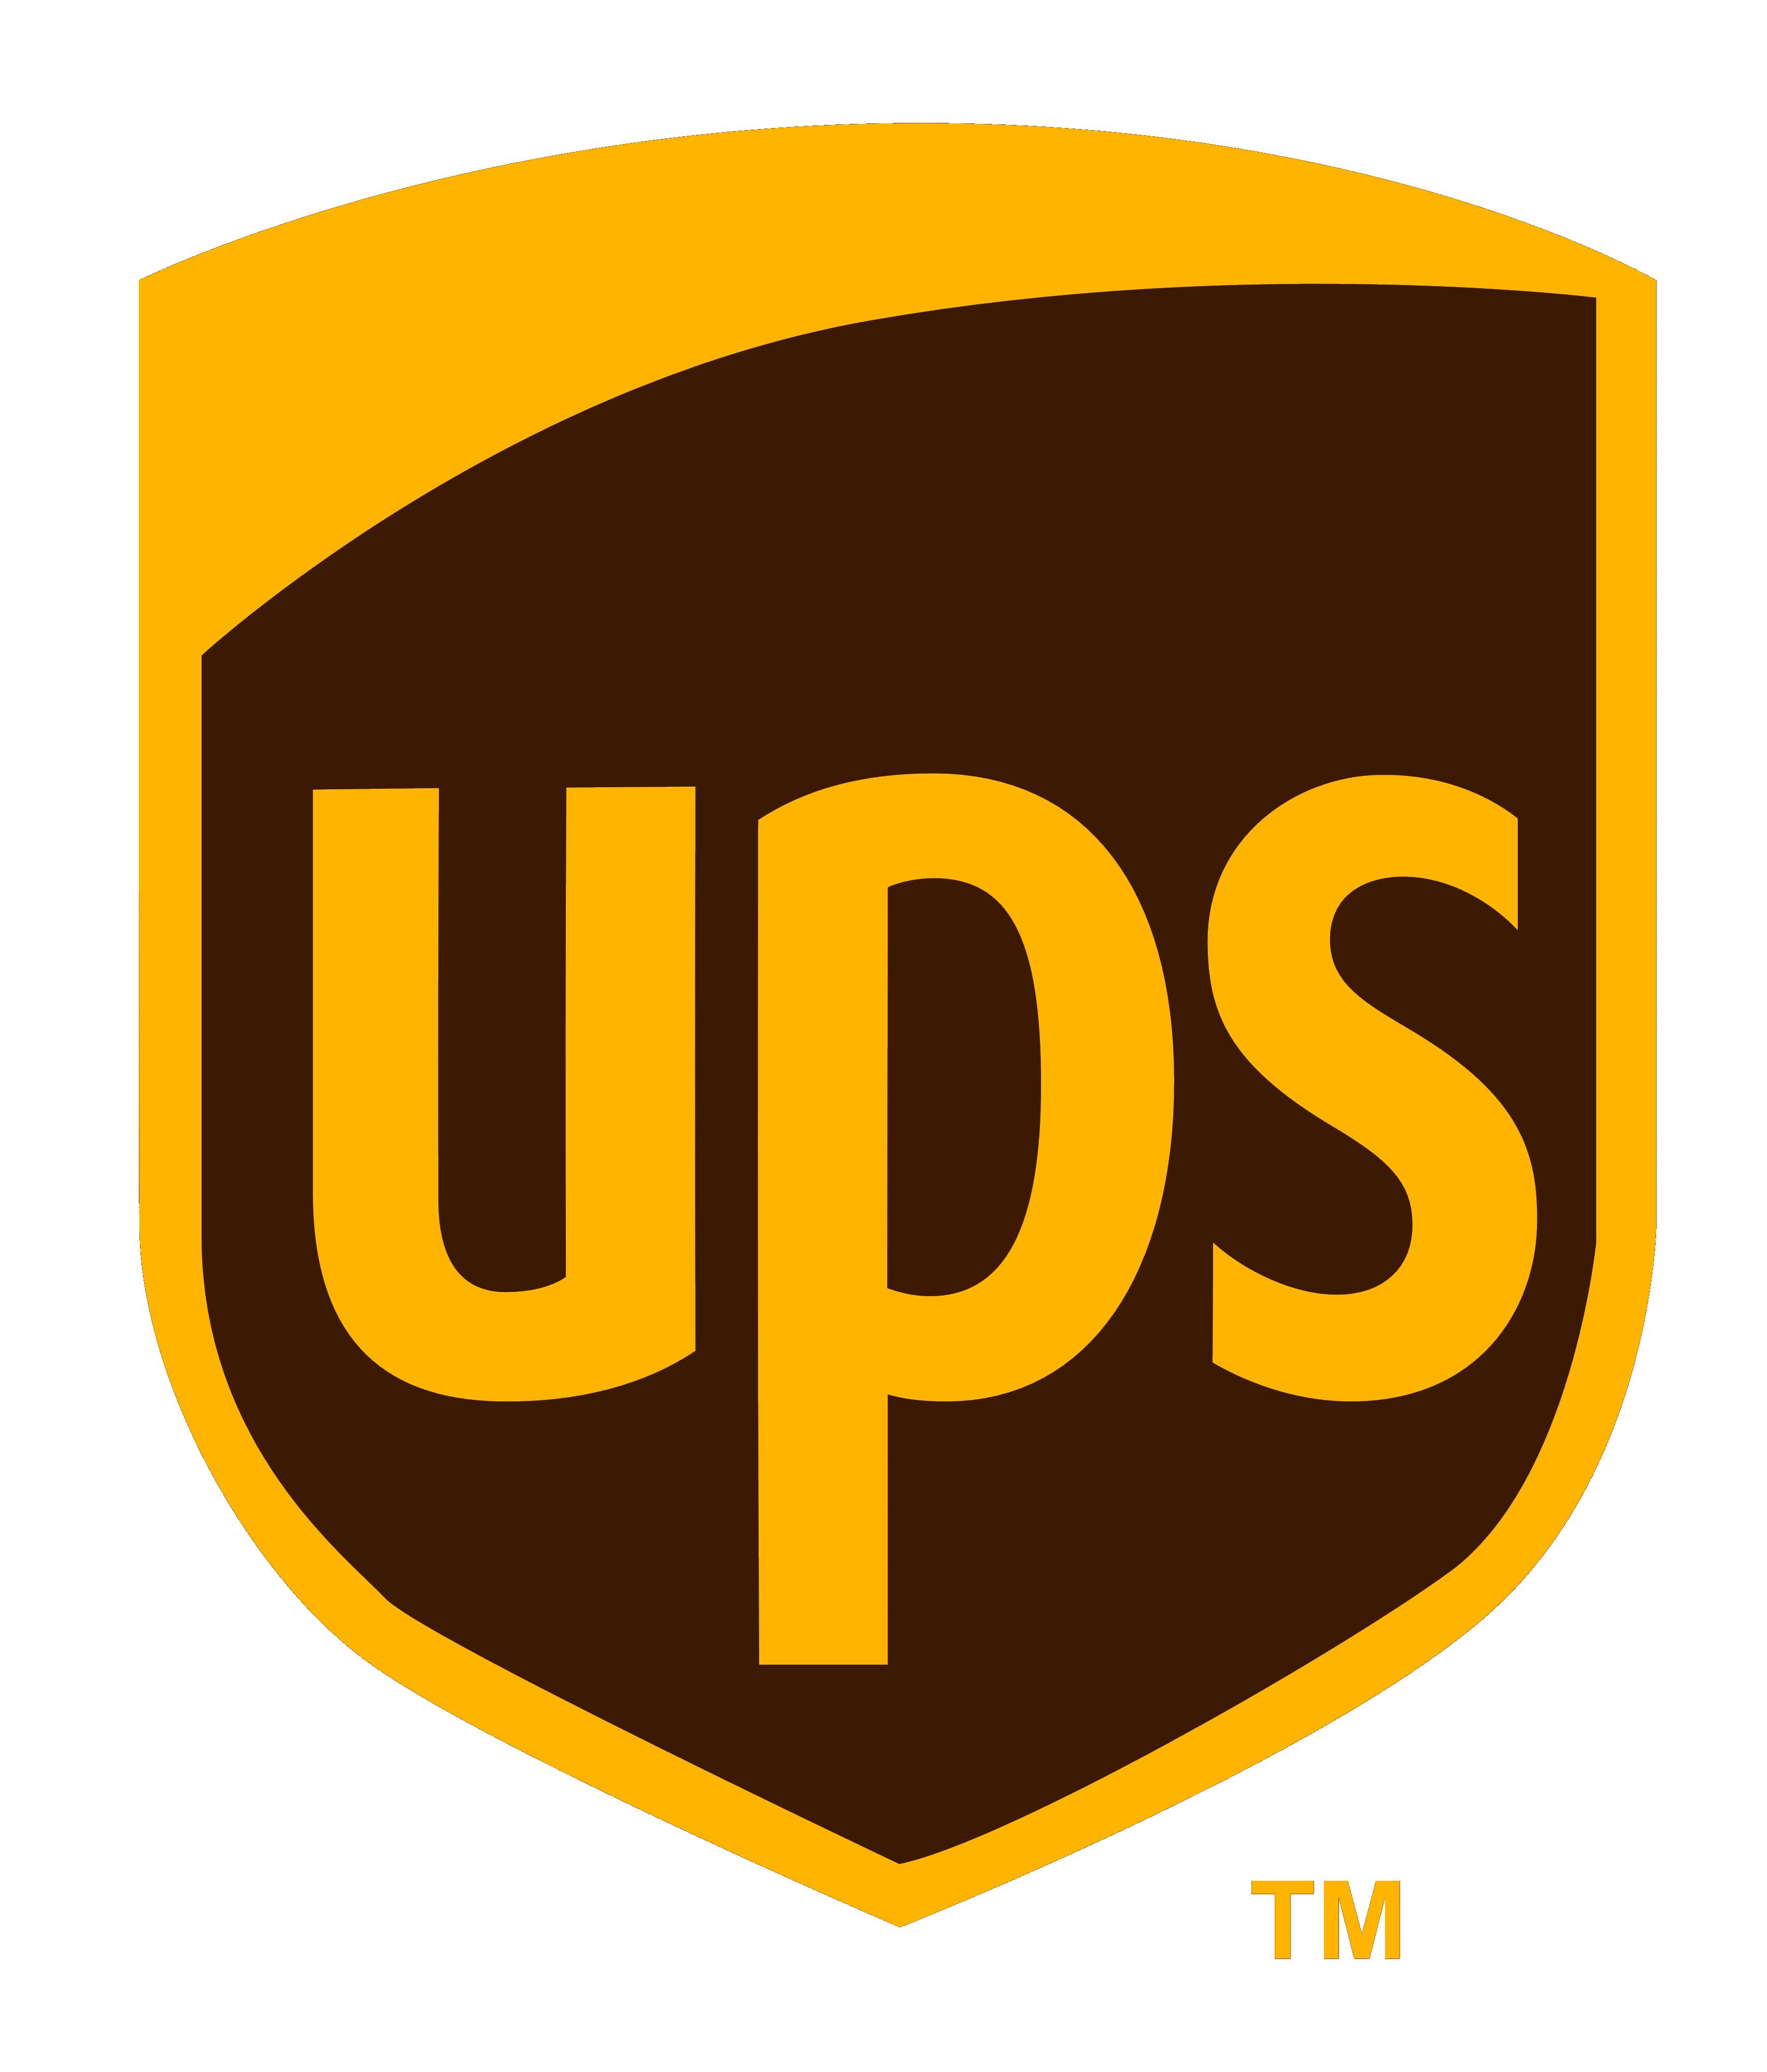 UPS Logo Wallpaper